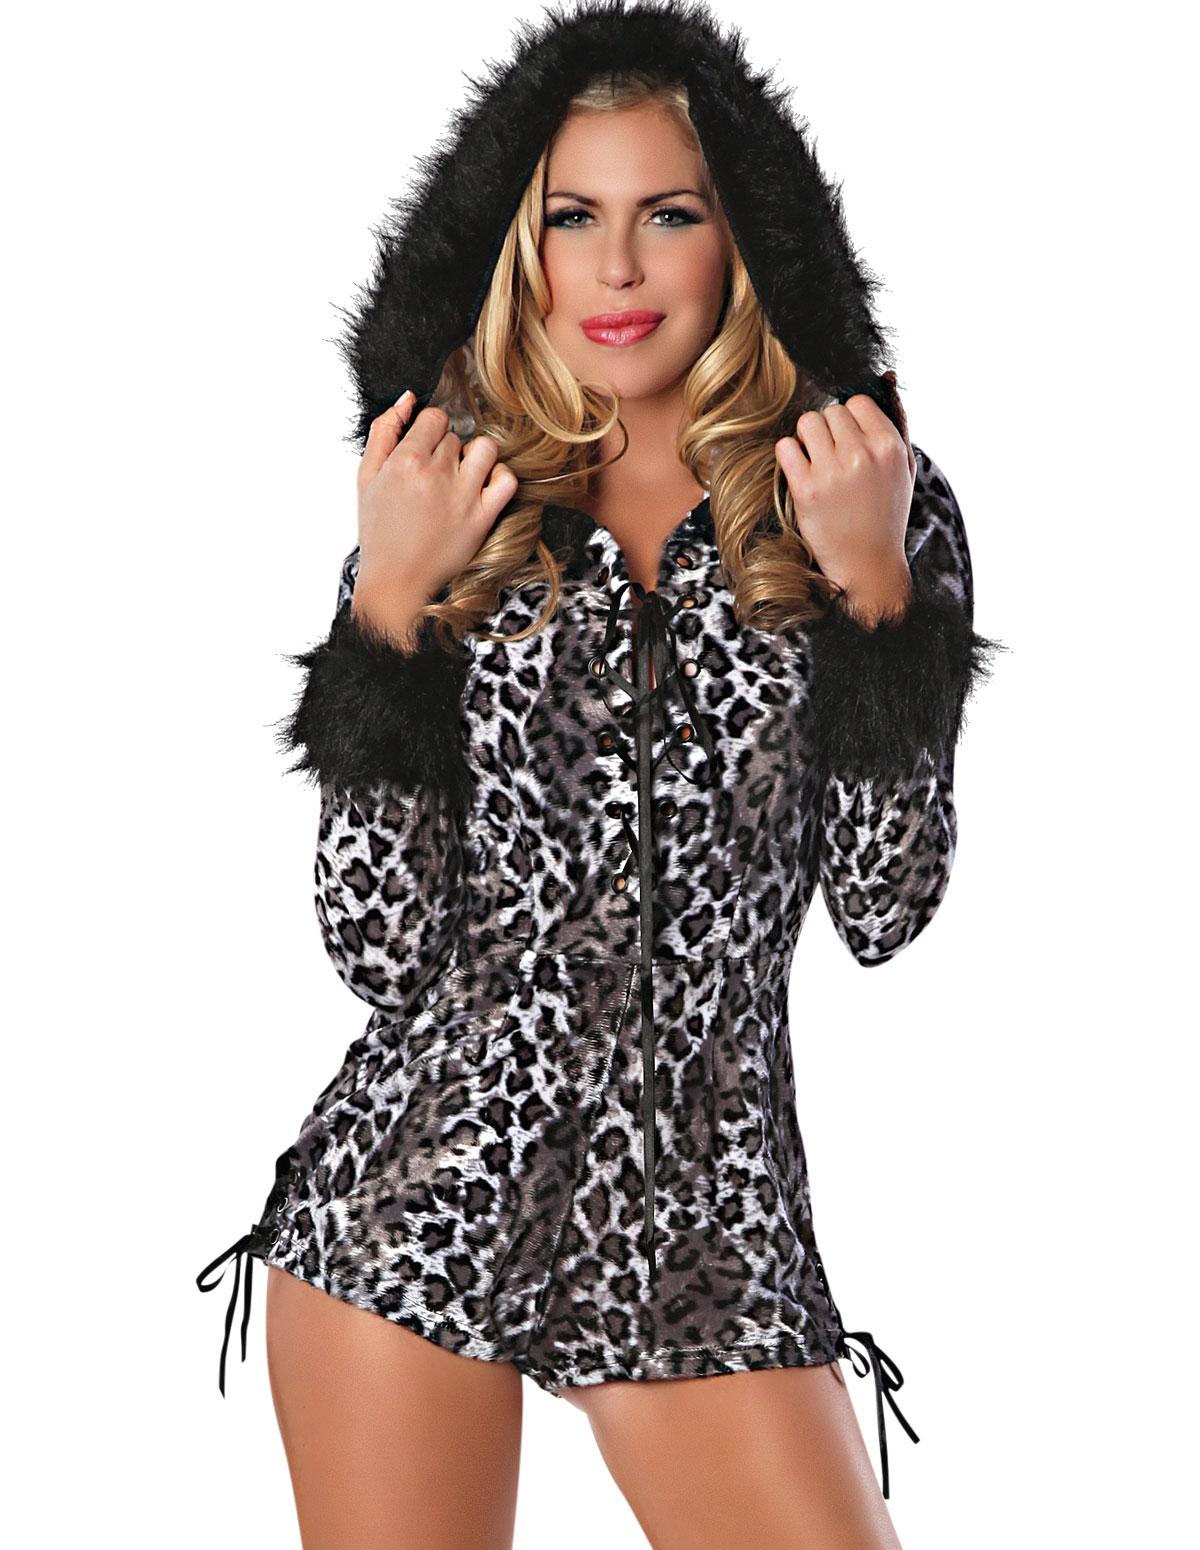 Sexy Snow Leopard Costume